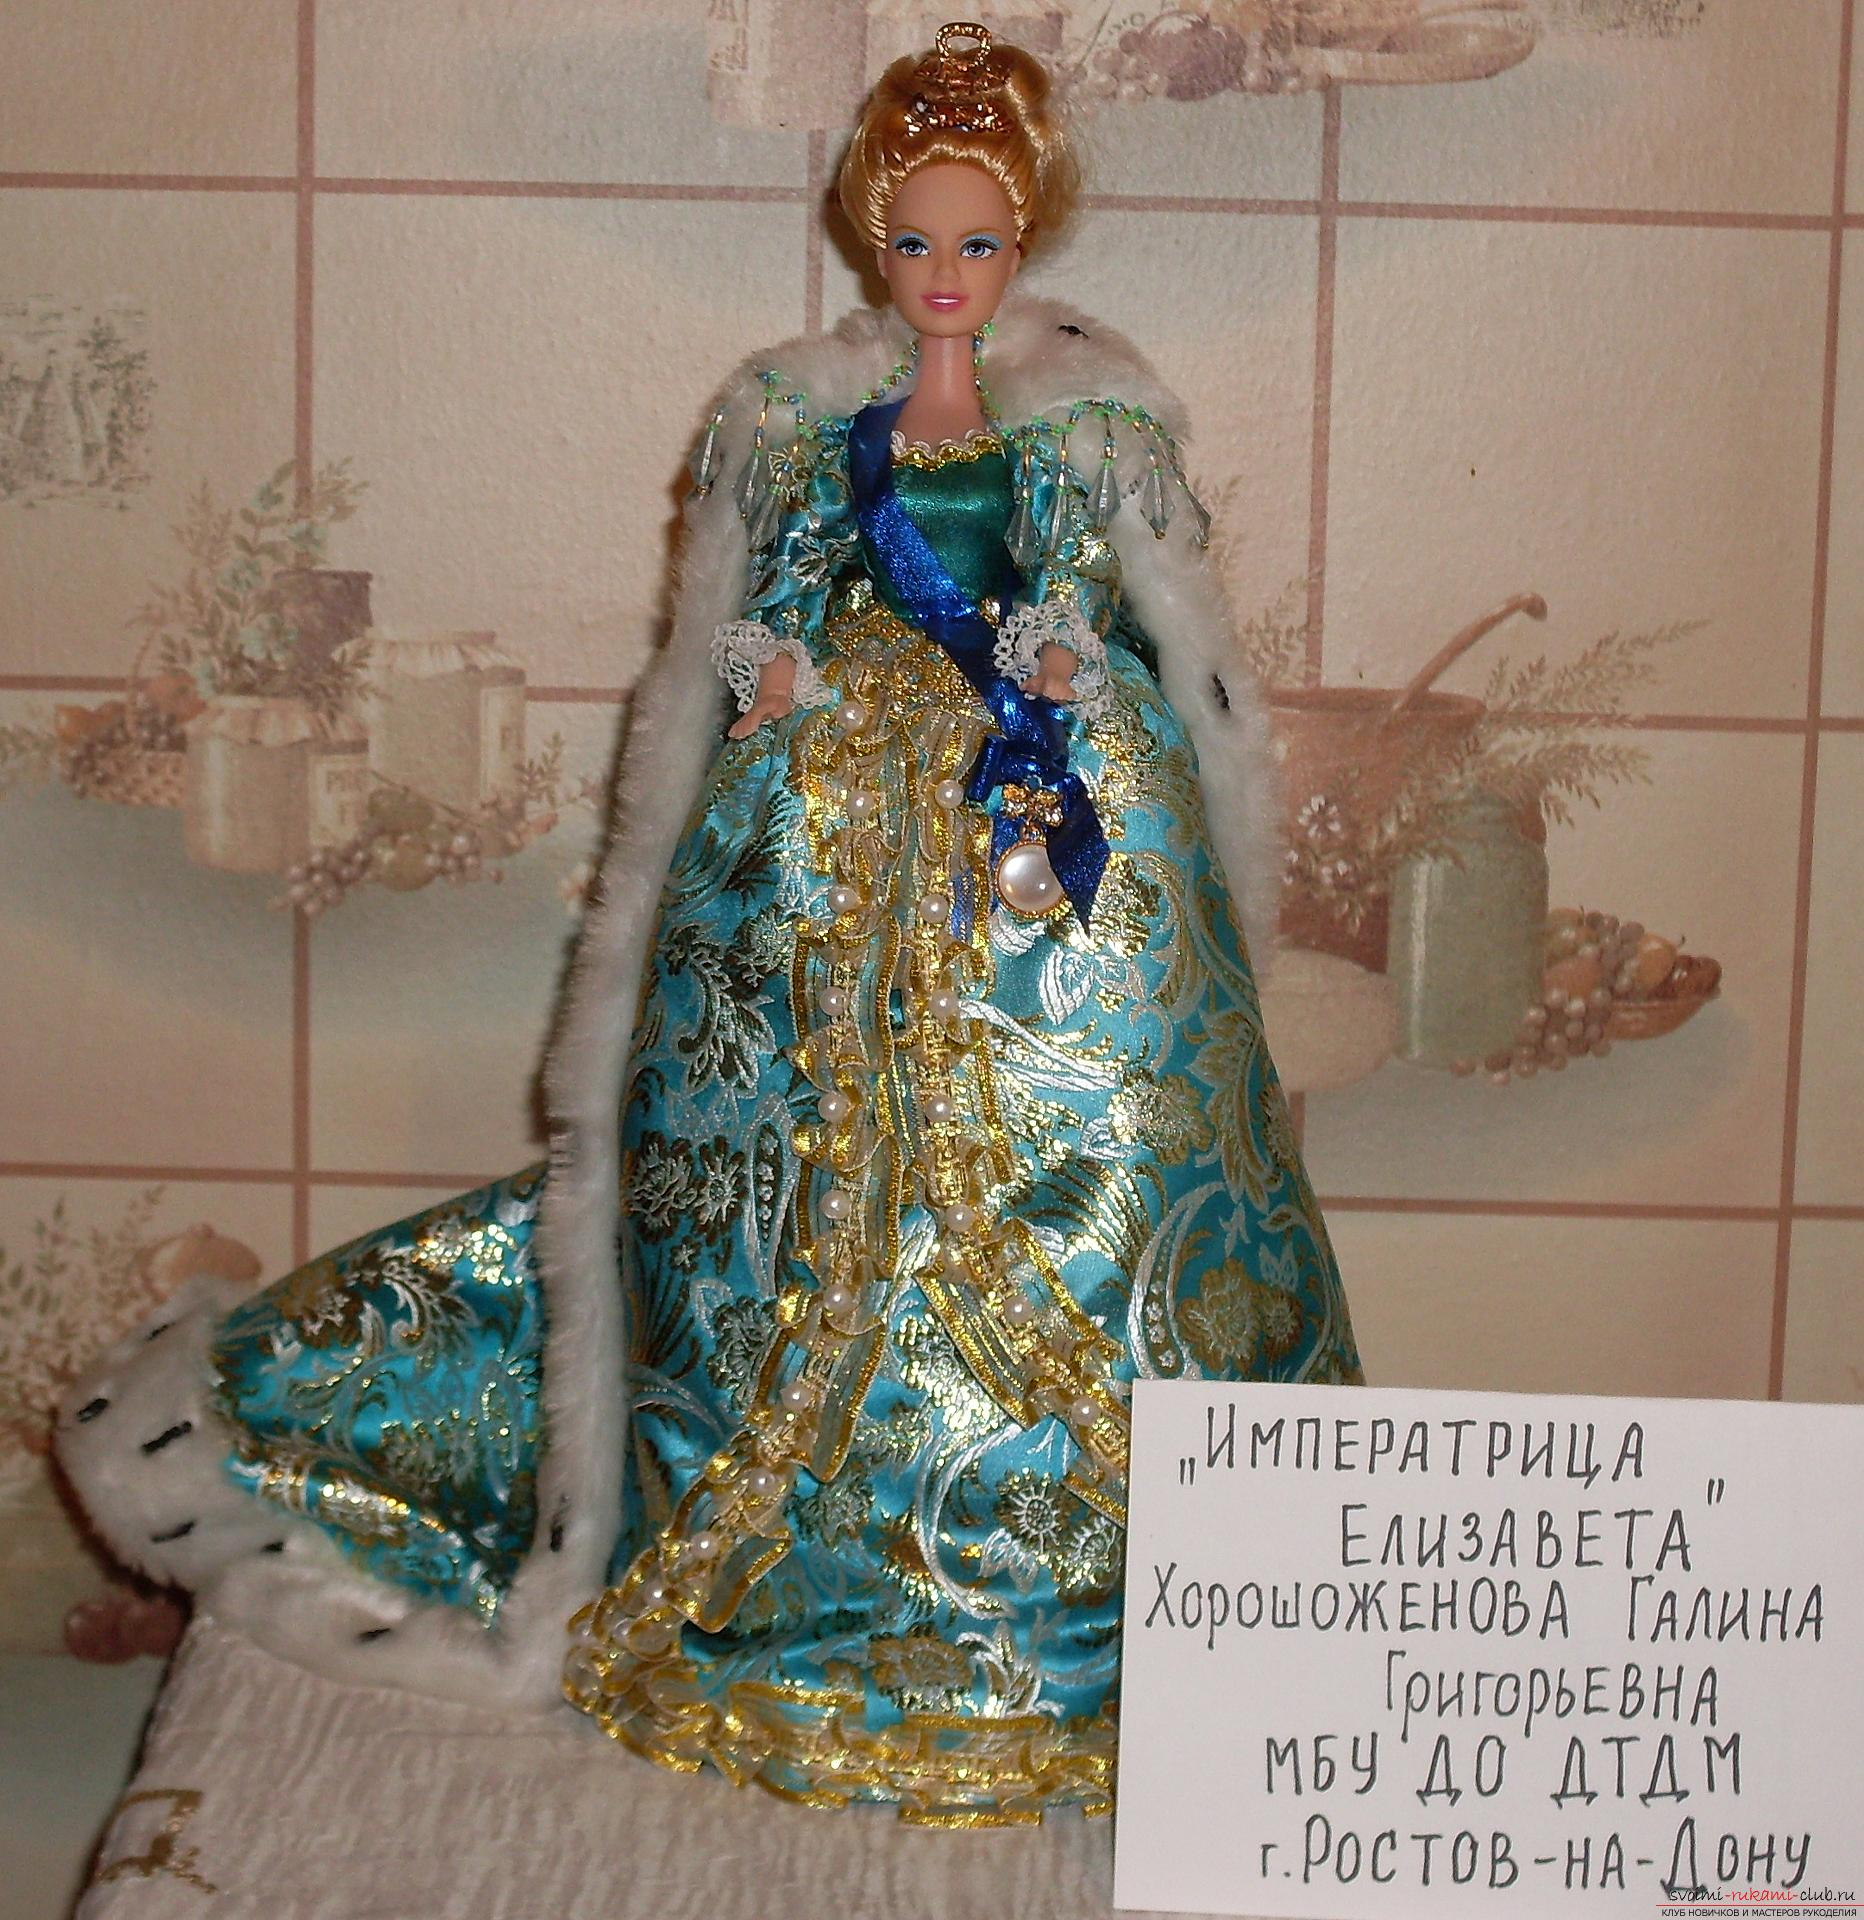 Акции и скидки супермаркетов Воронежа